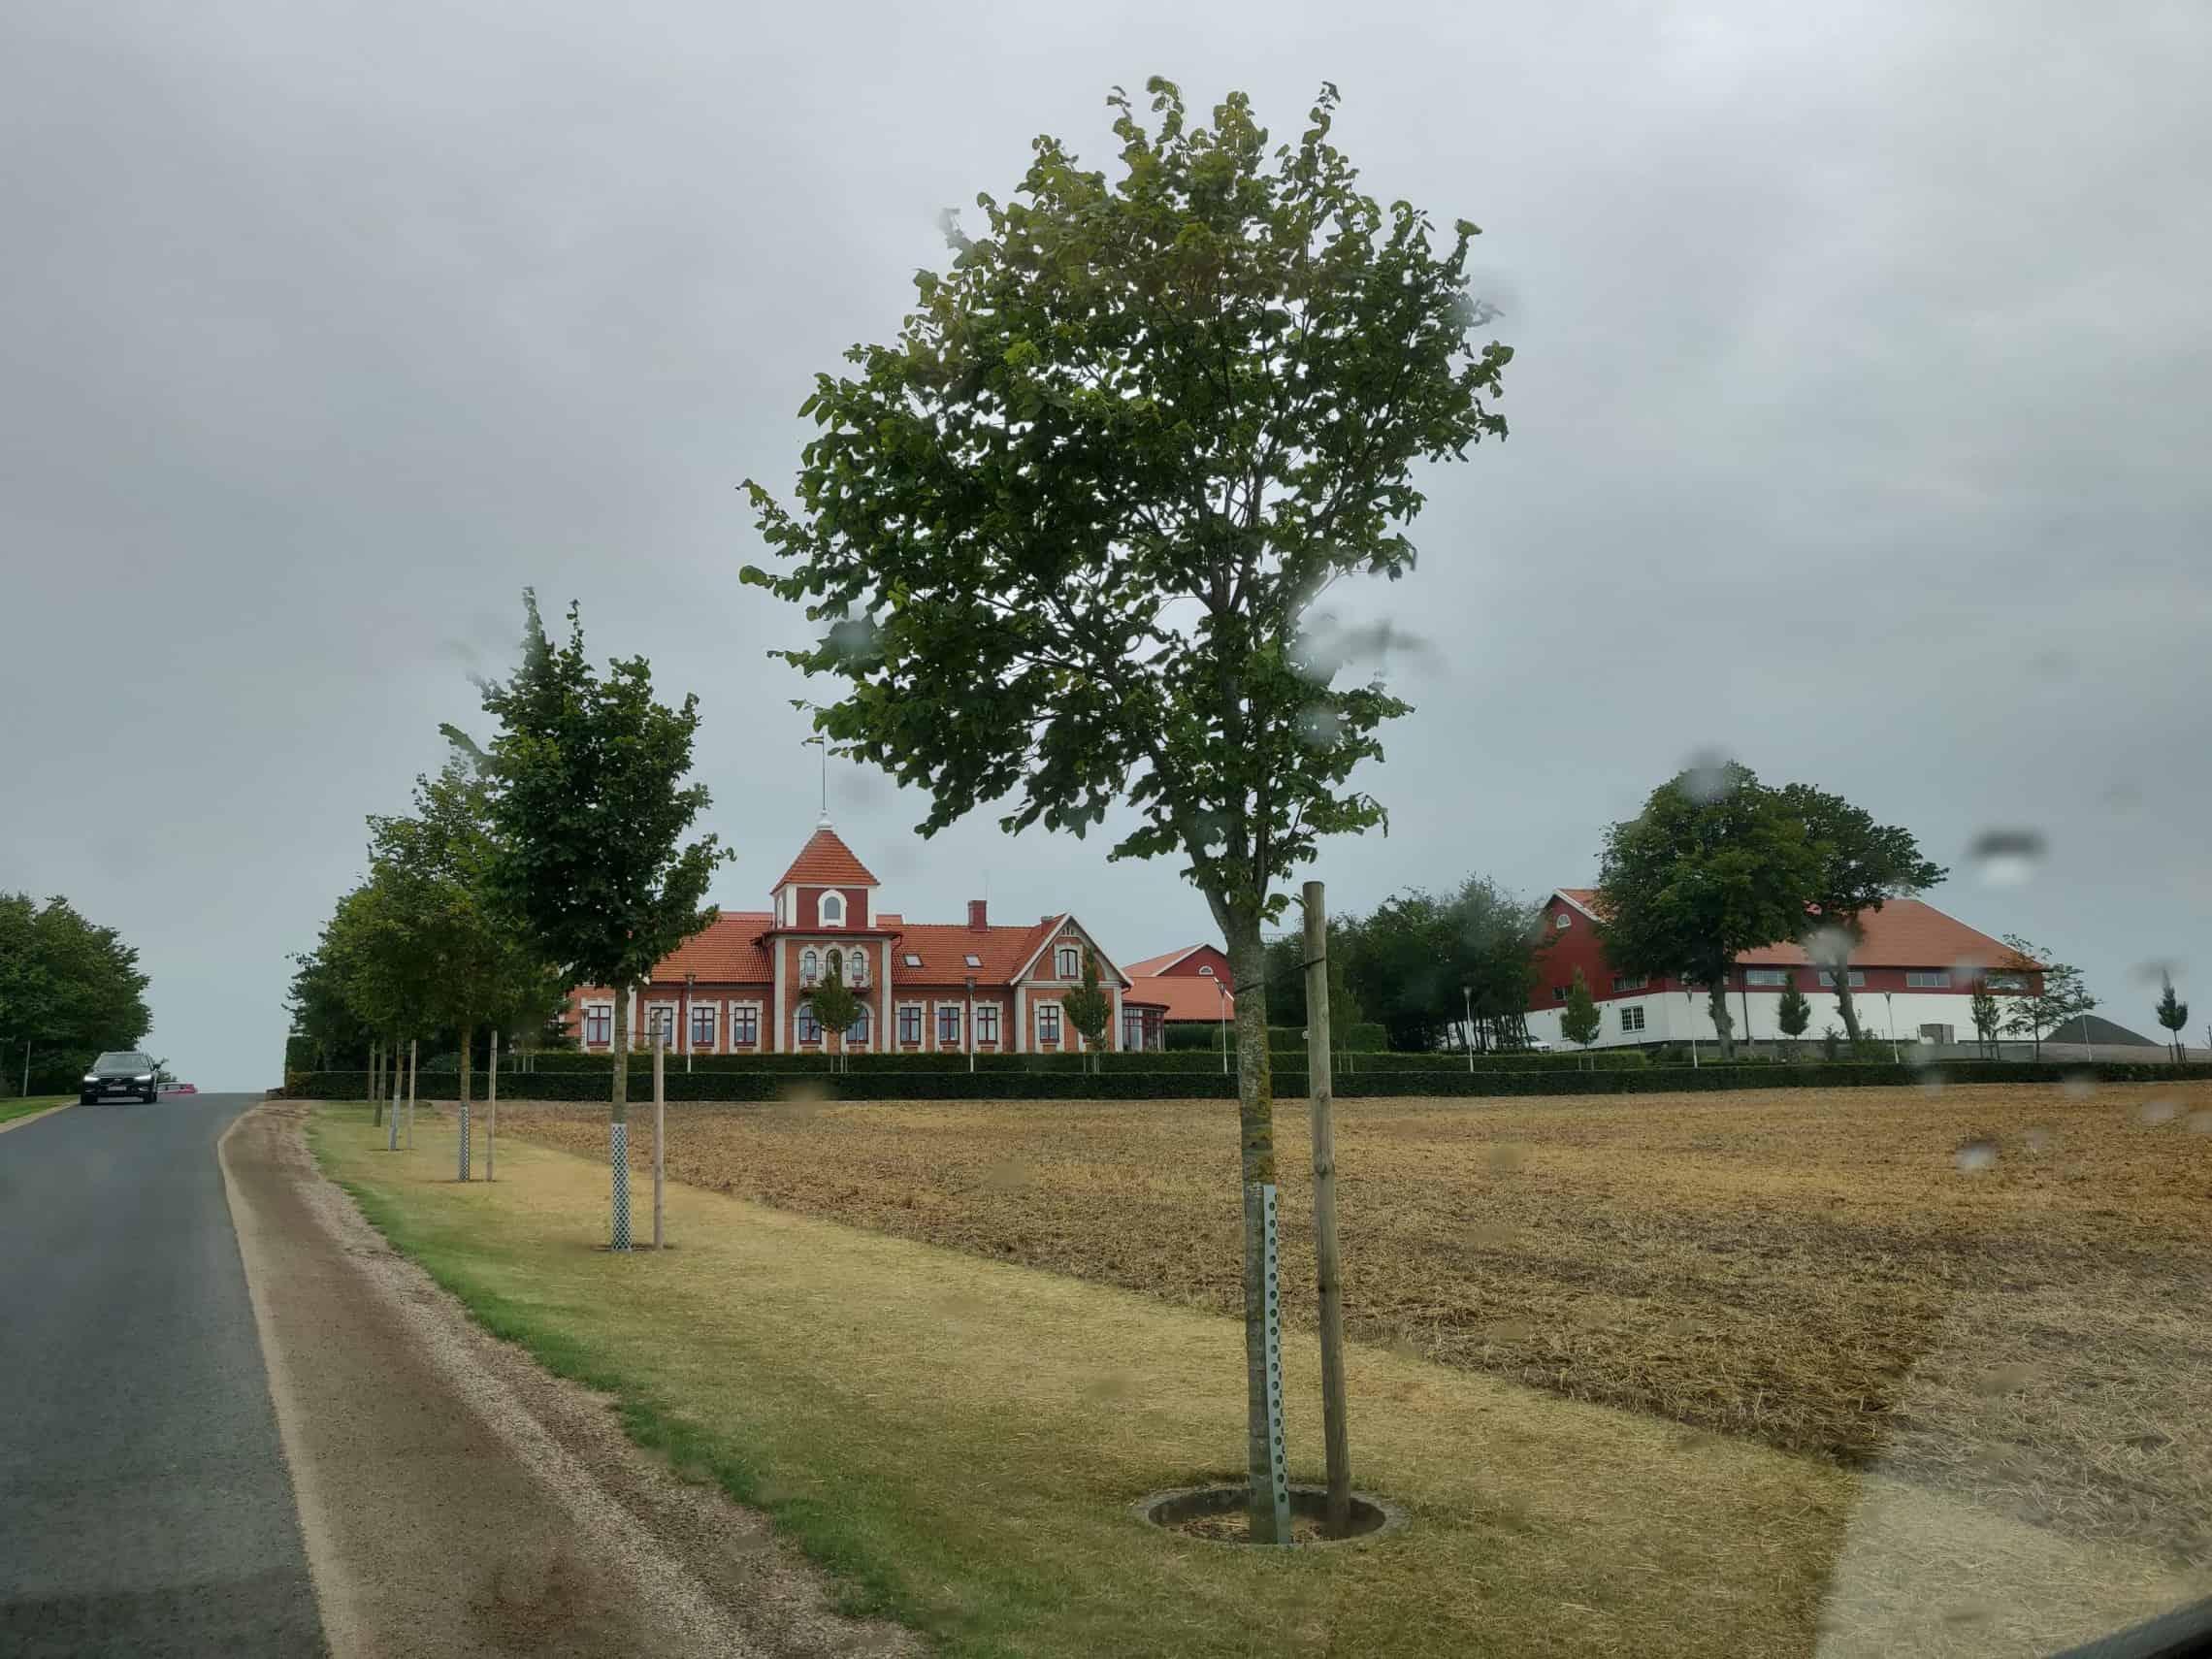 Matresa i södra Sverige 29